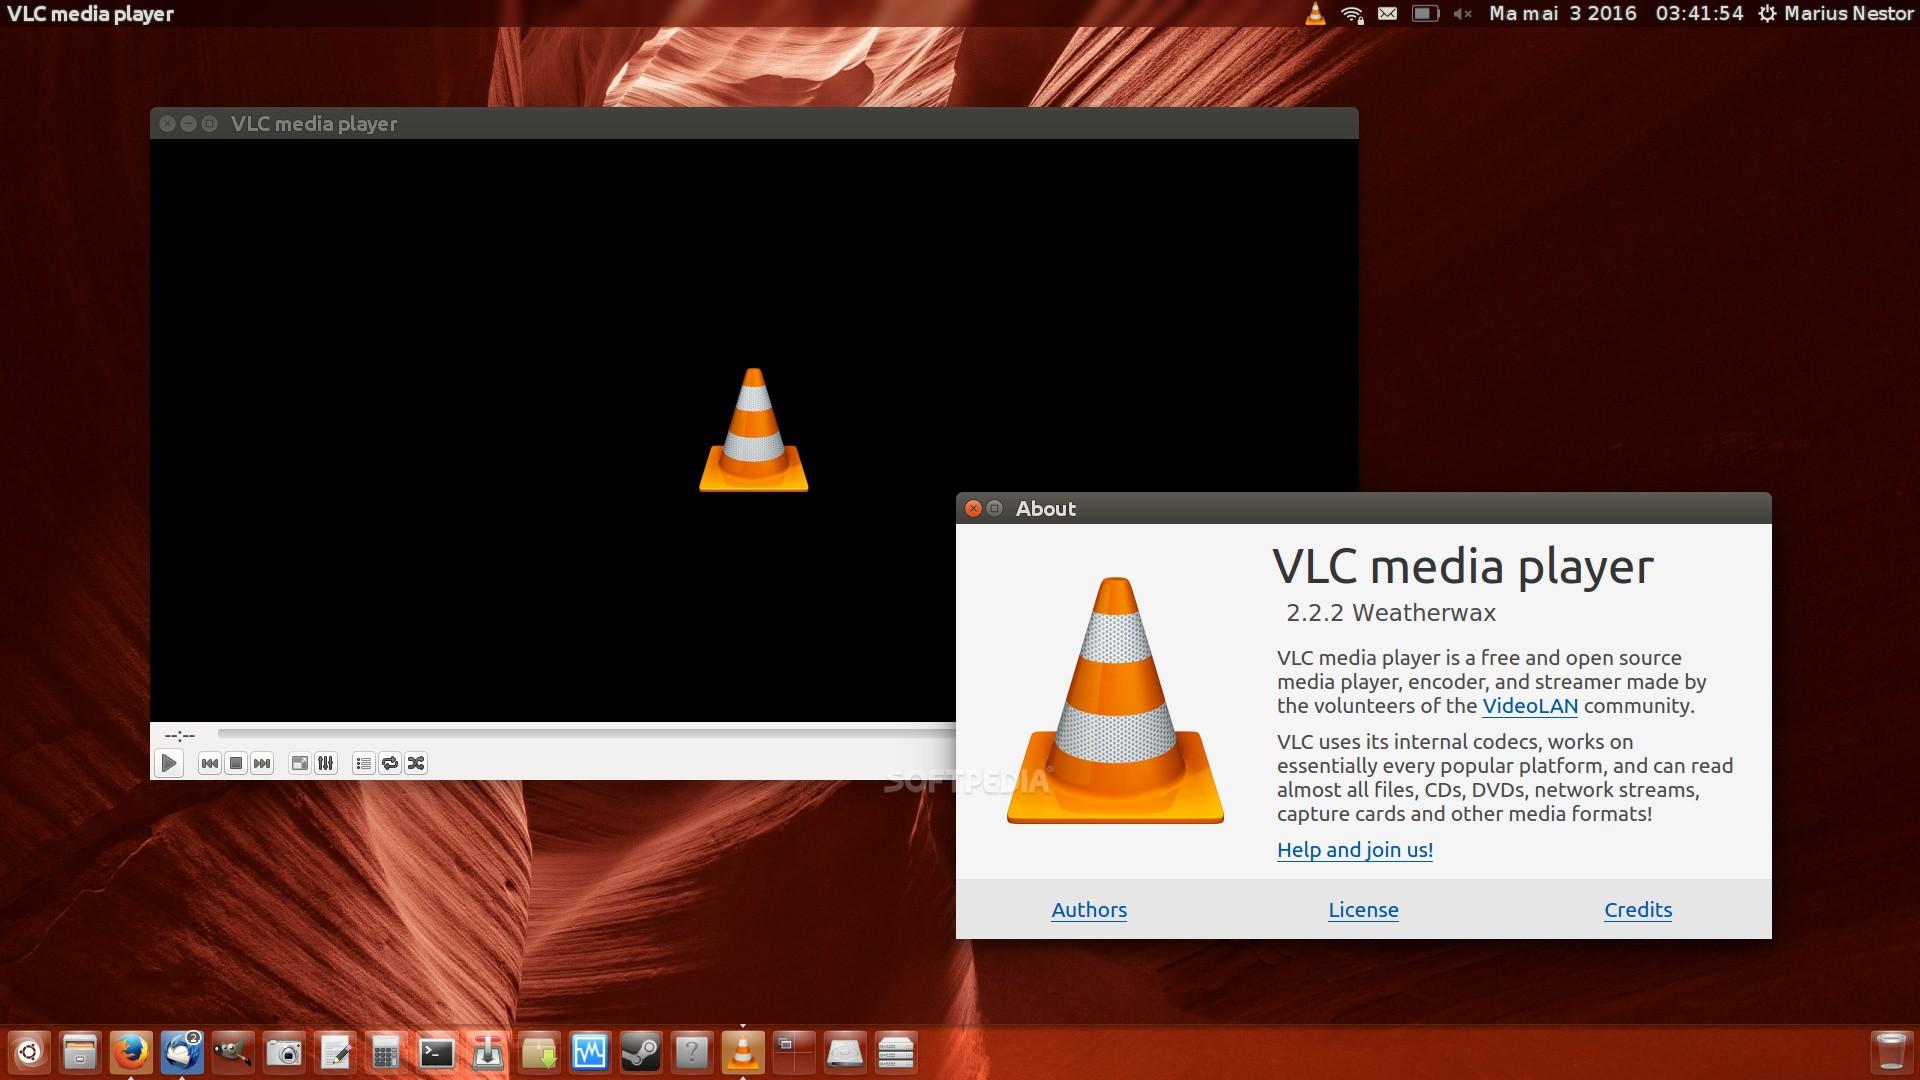 VLC Media Player 2 2 3 Improves MKV Tags Support, Fixes WMV